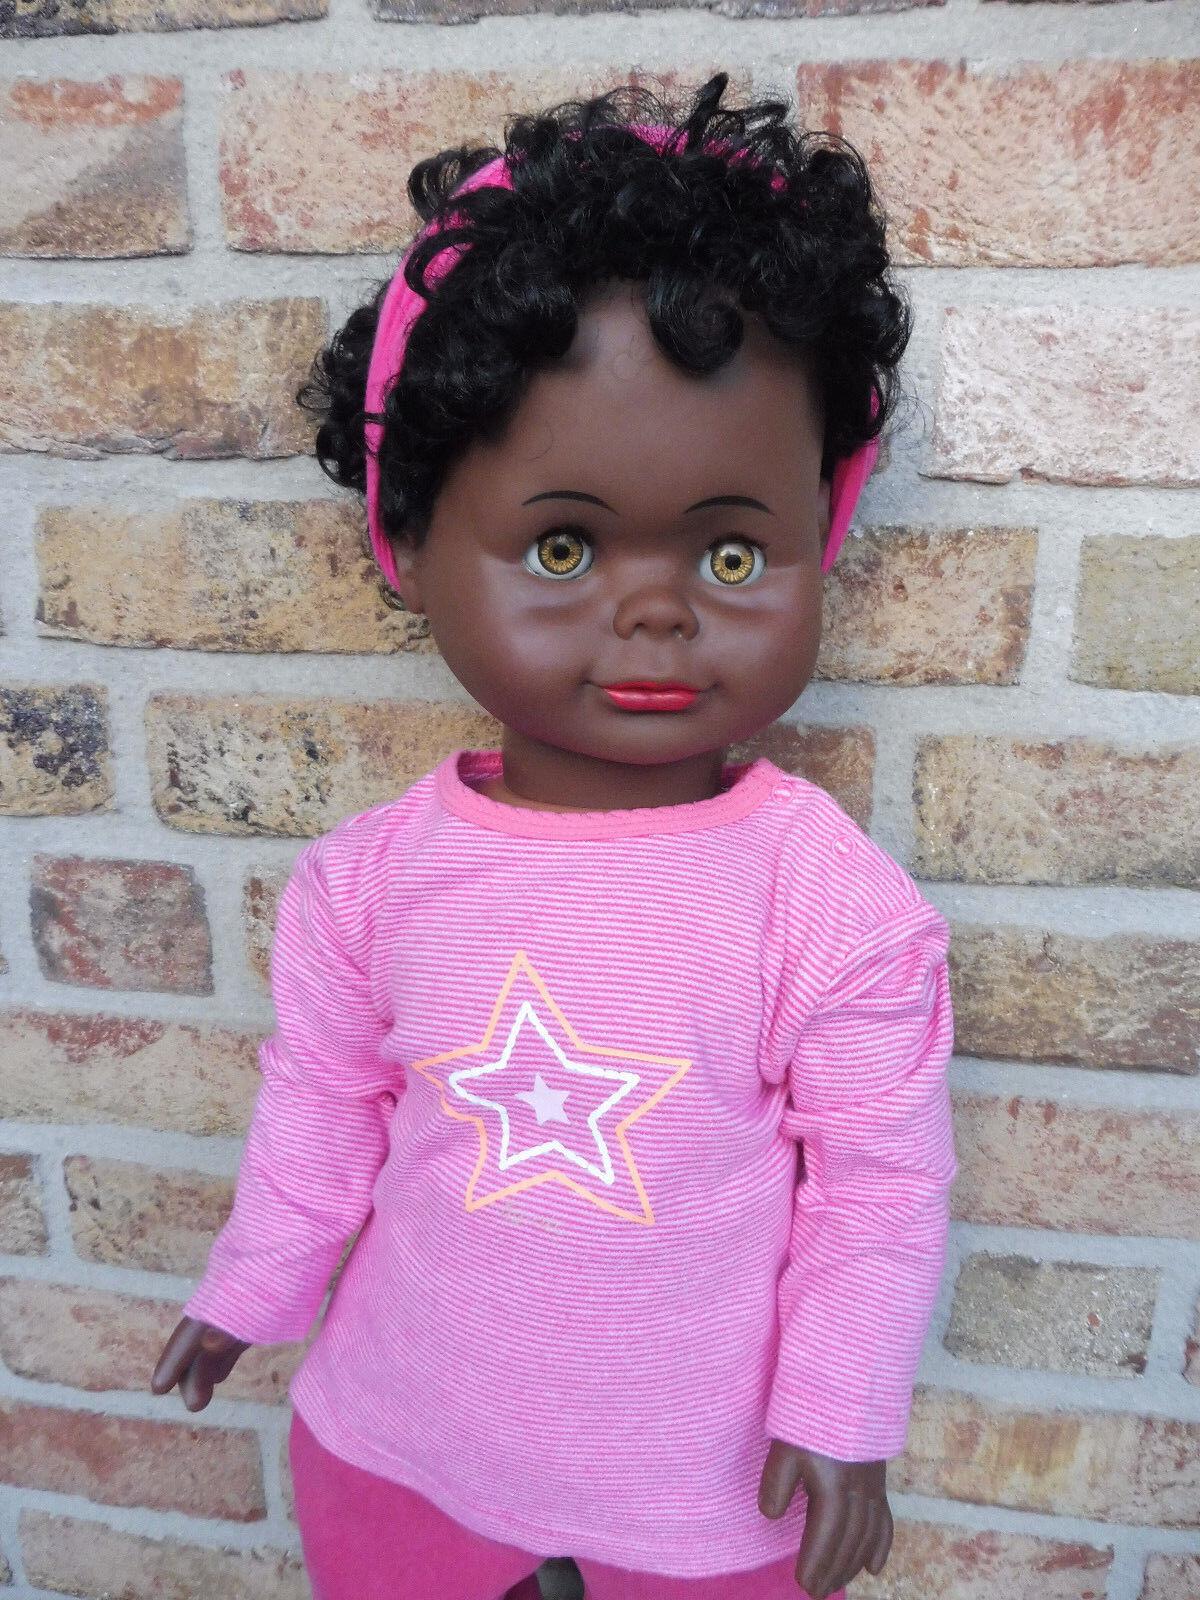 Lissi Bätz Puppe dunkelhäutig ca. 70 cm groß sehr selten aus den 70 er